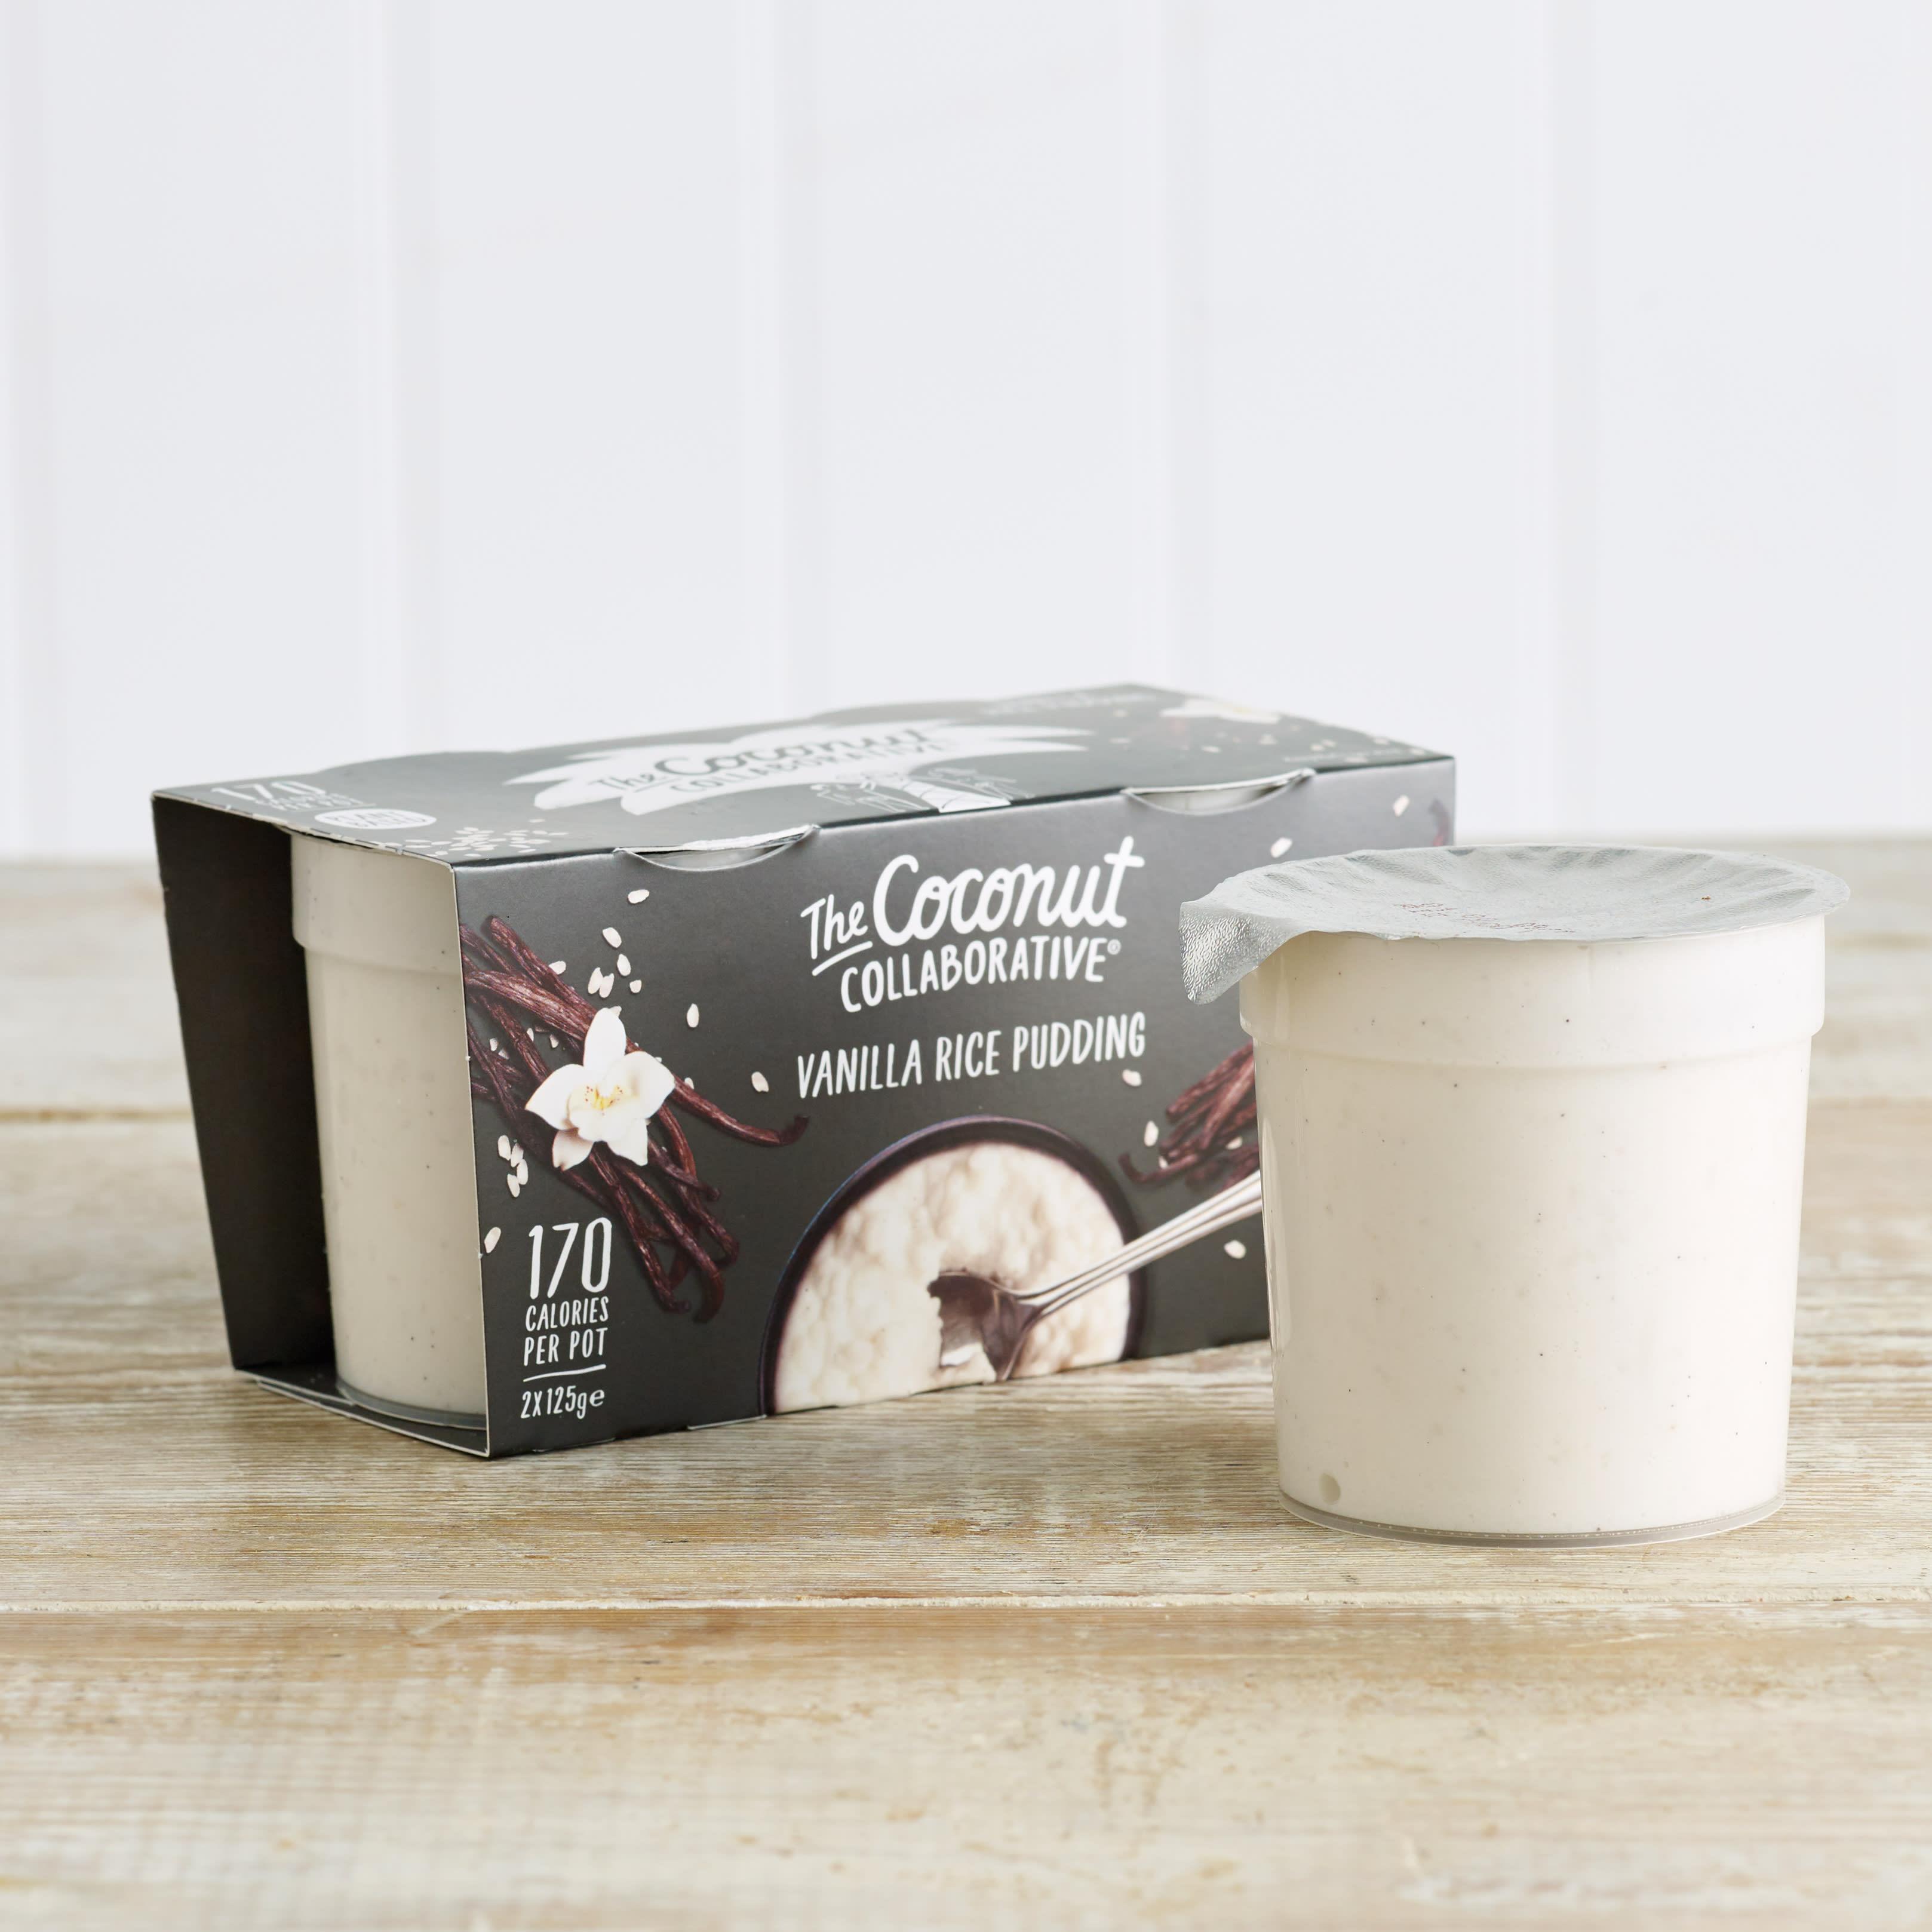 The Coconut Collaborative Dairy Free Vanilla Rice Pudding, 2 x 125g